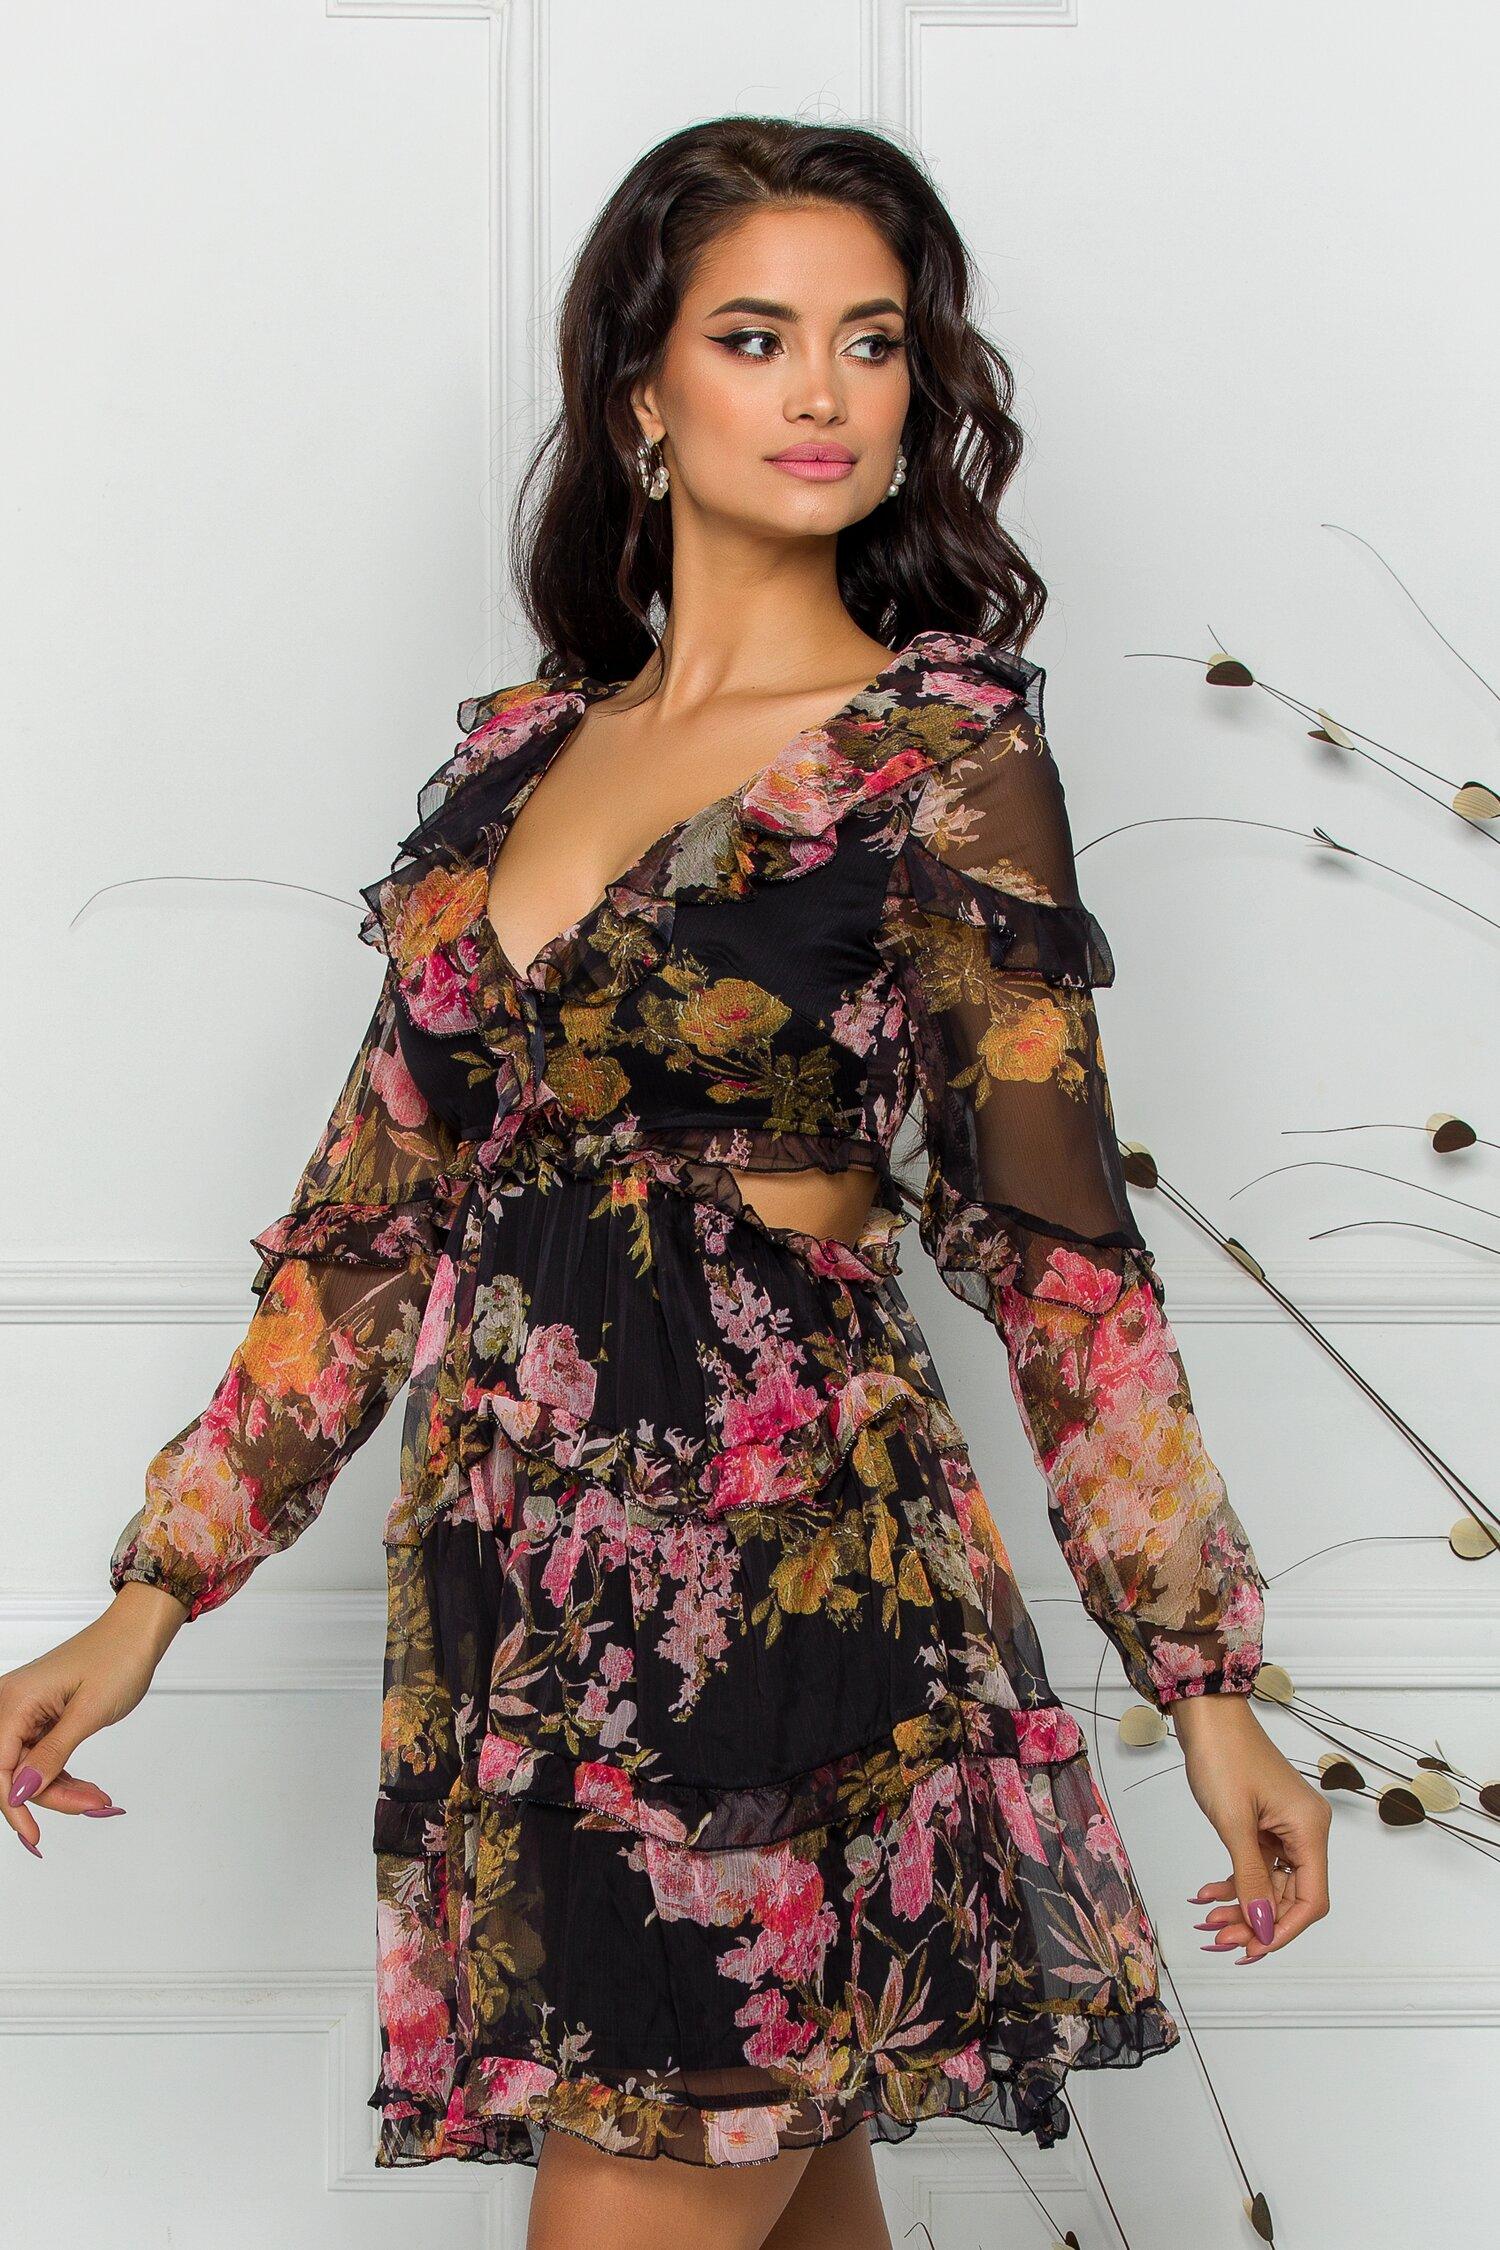 Rochie Rizzie neagra cu imprimeuri florale si decupaje in talie imagine dyfashion.ro 2021